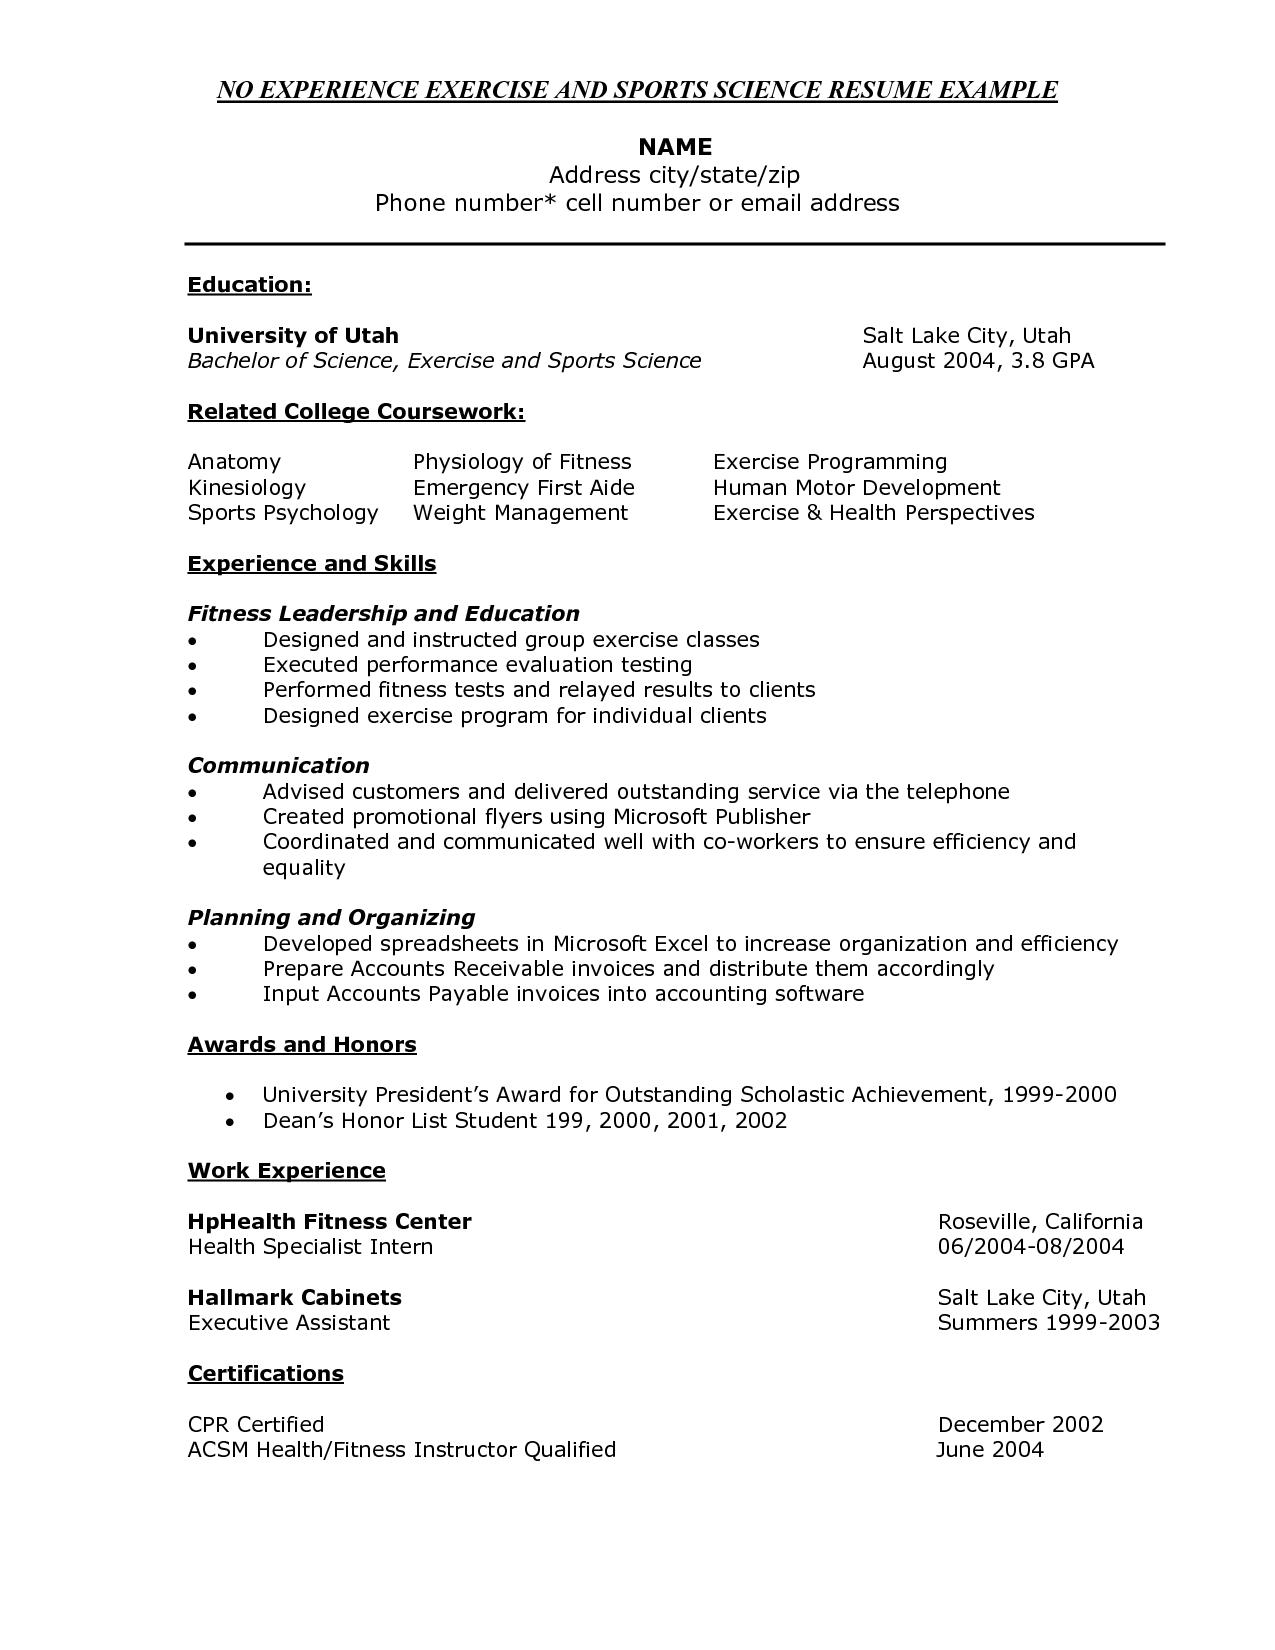 resume samplesample for fresh graduate sample